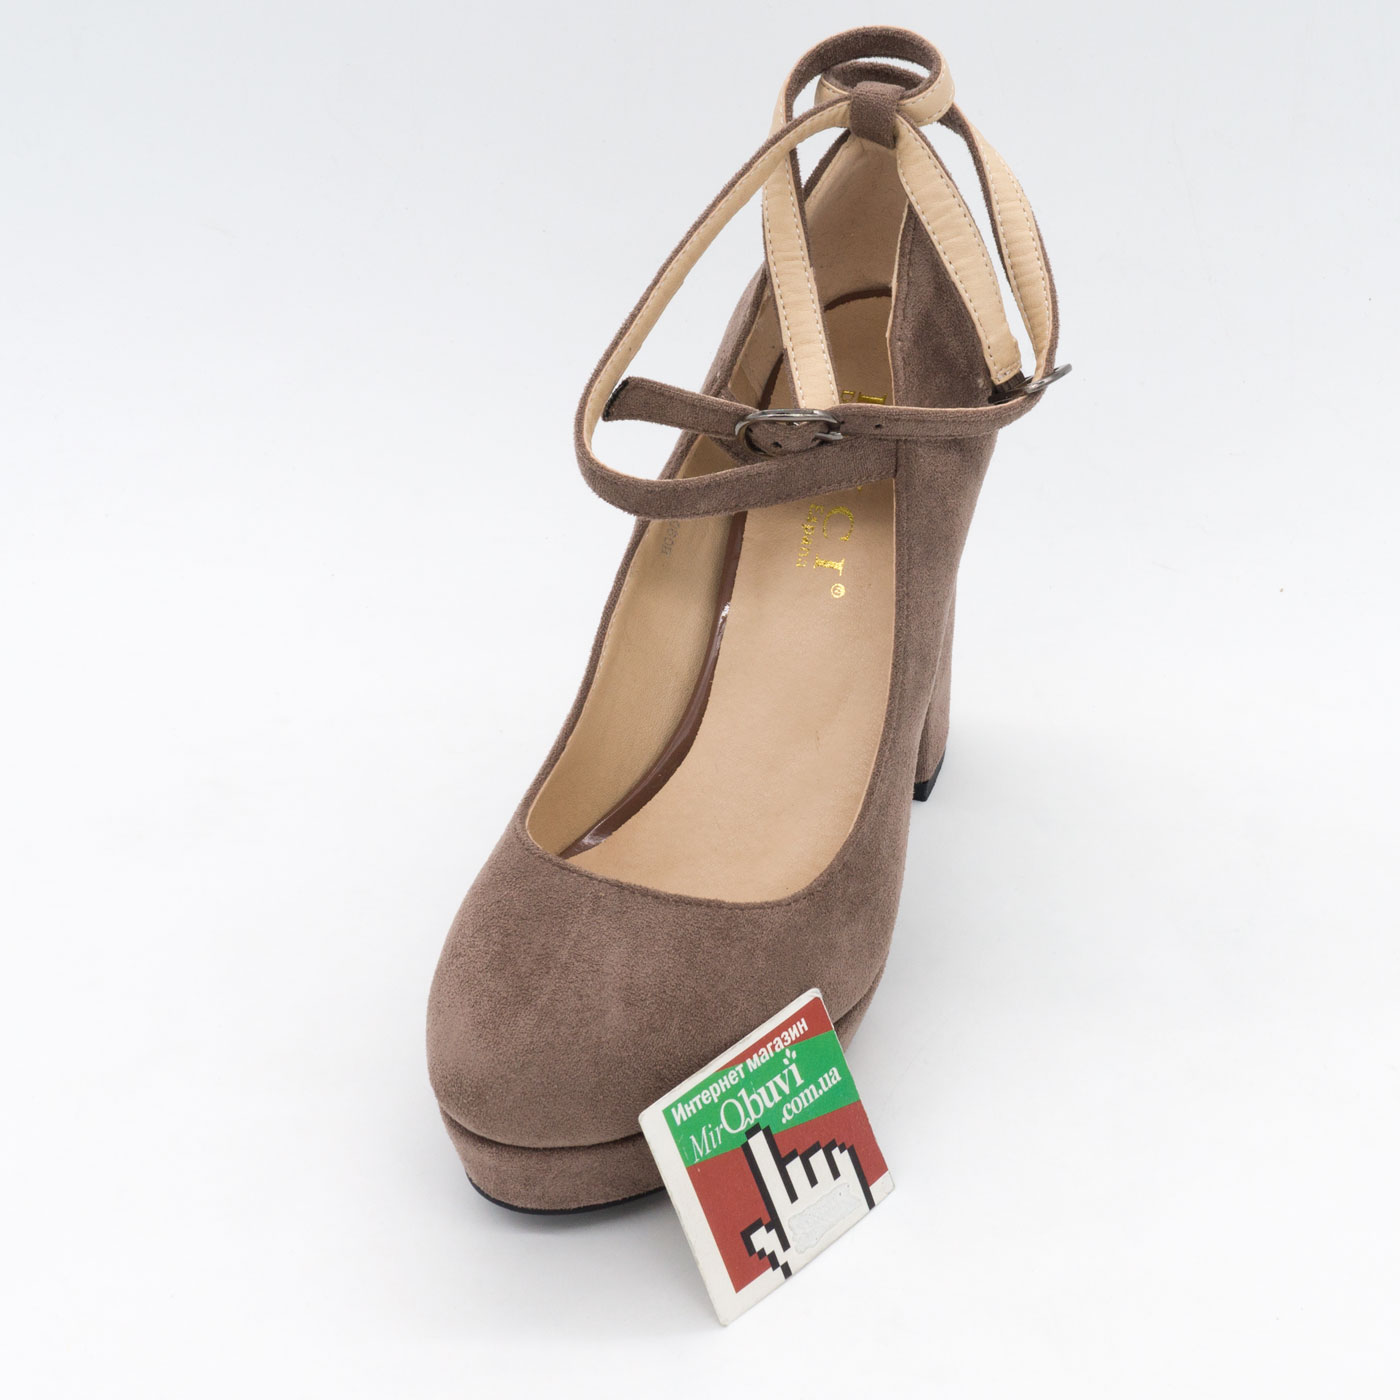 фото front Женские туфли LIICI H095-B668 Apricot на платформе  front